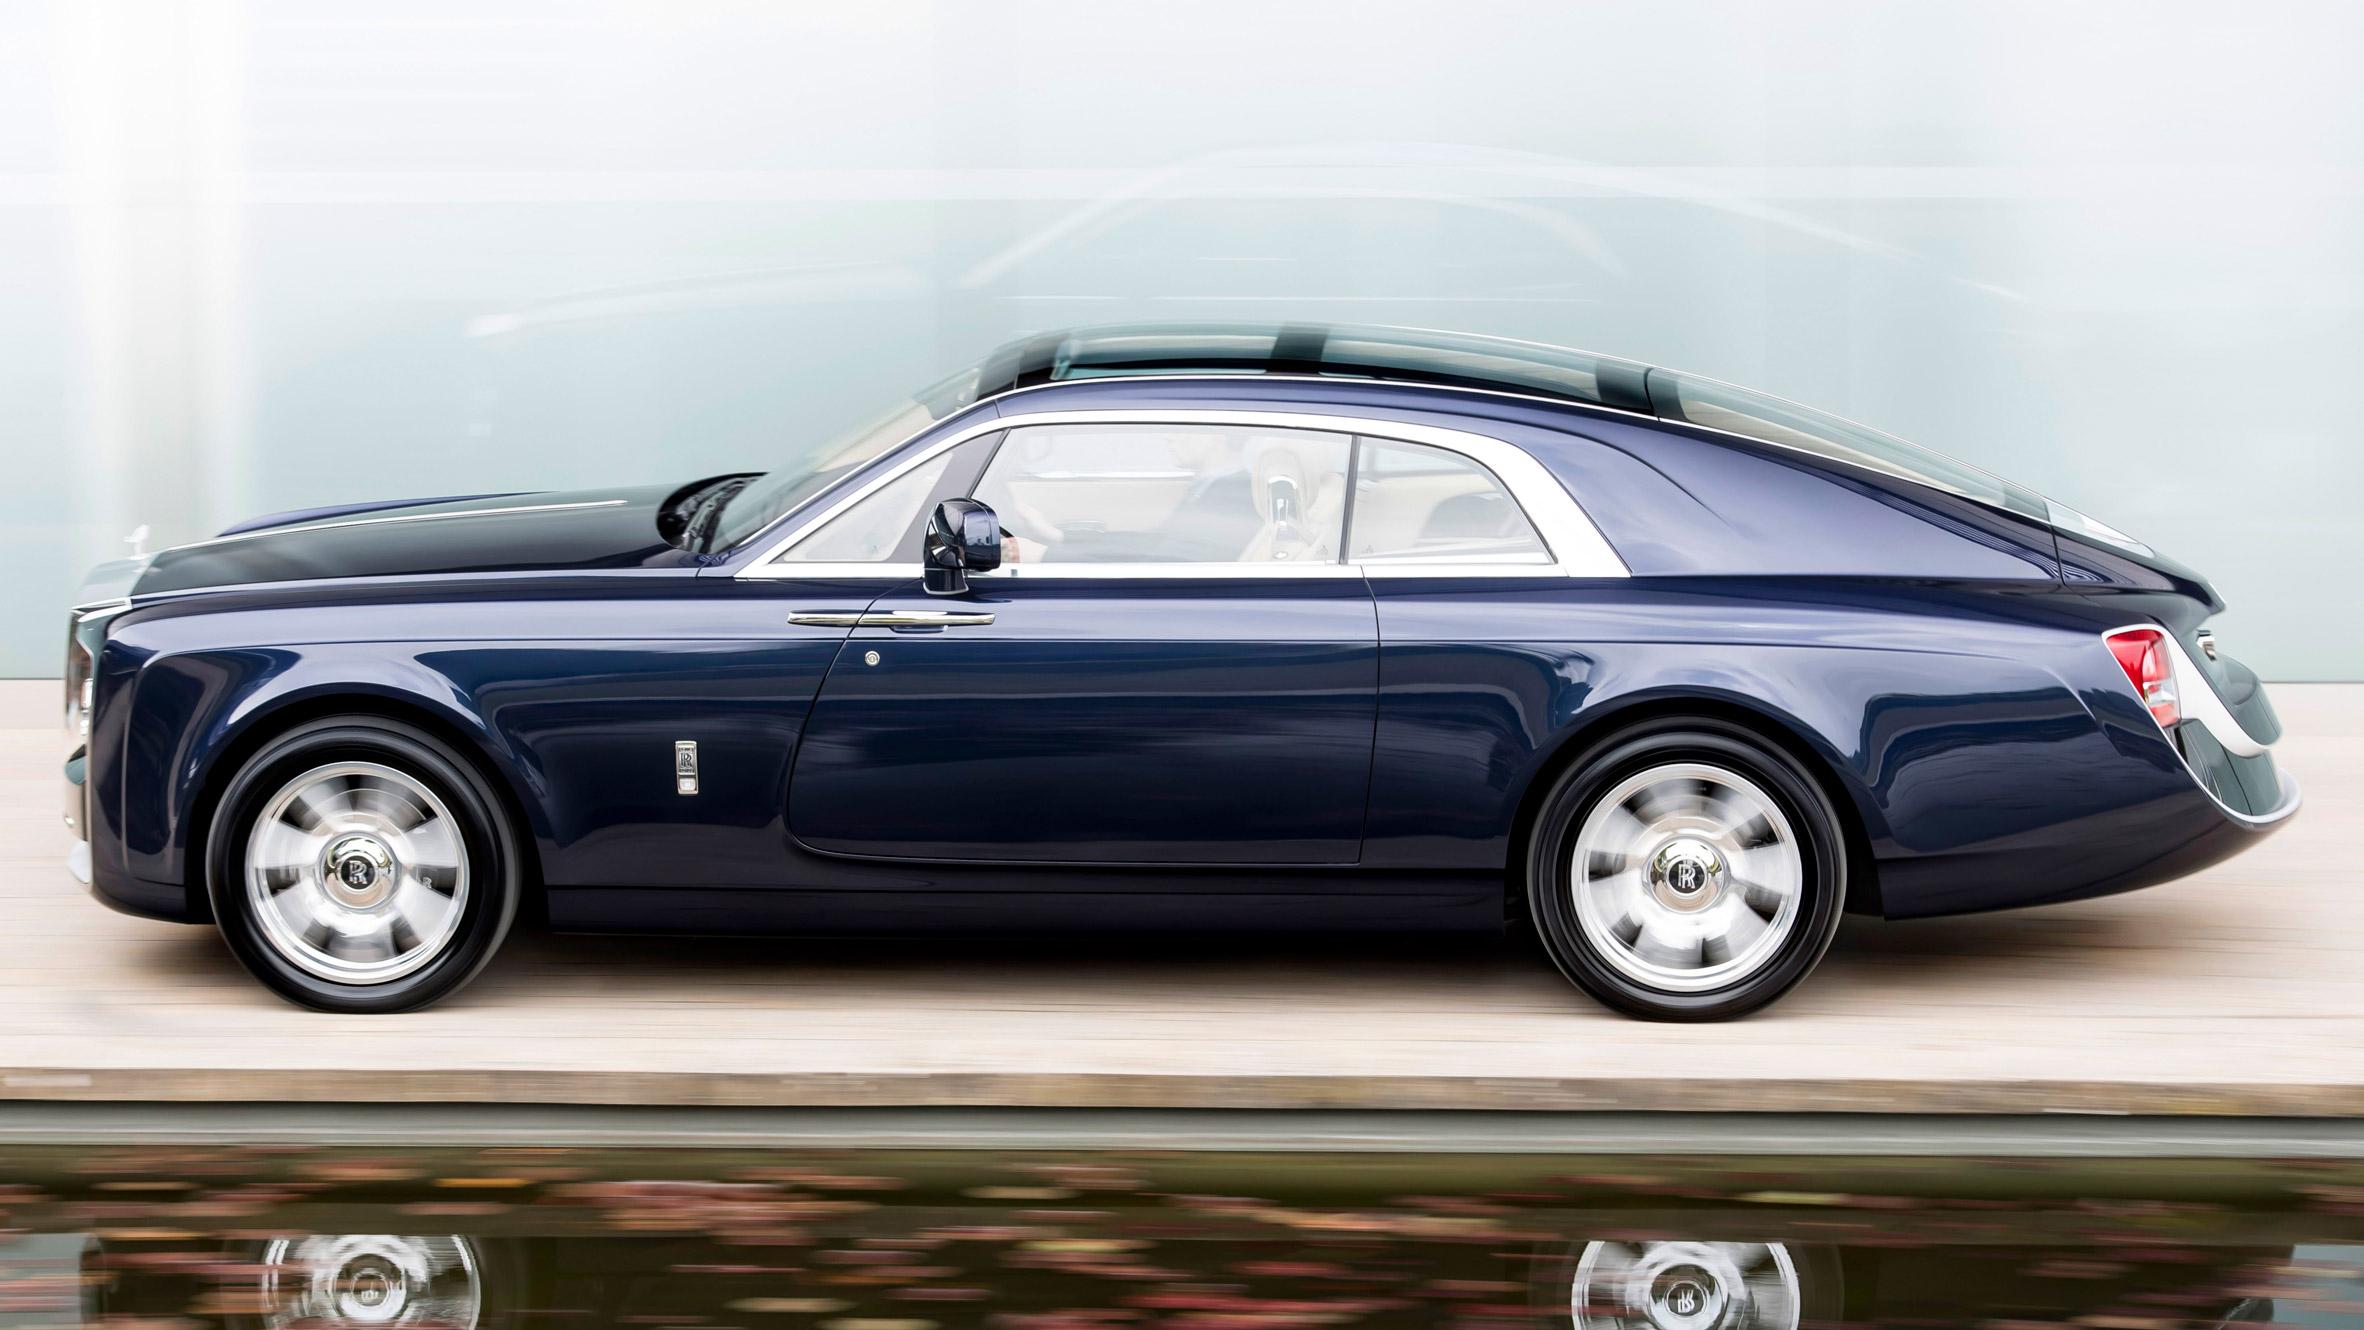 Rolls Royce Unveils Bespoke Sweptail Car Worth 13000000 Antivirus Avast Premier 3 Pc Tahun